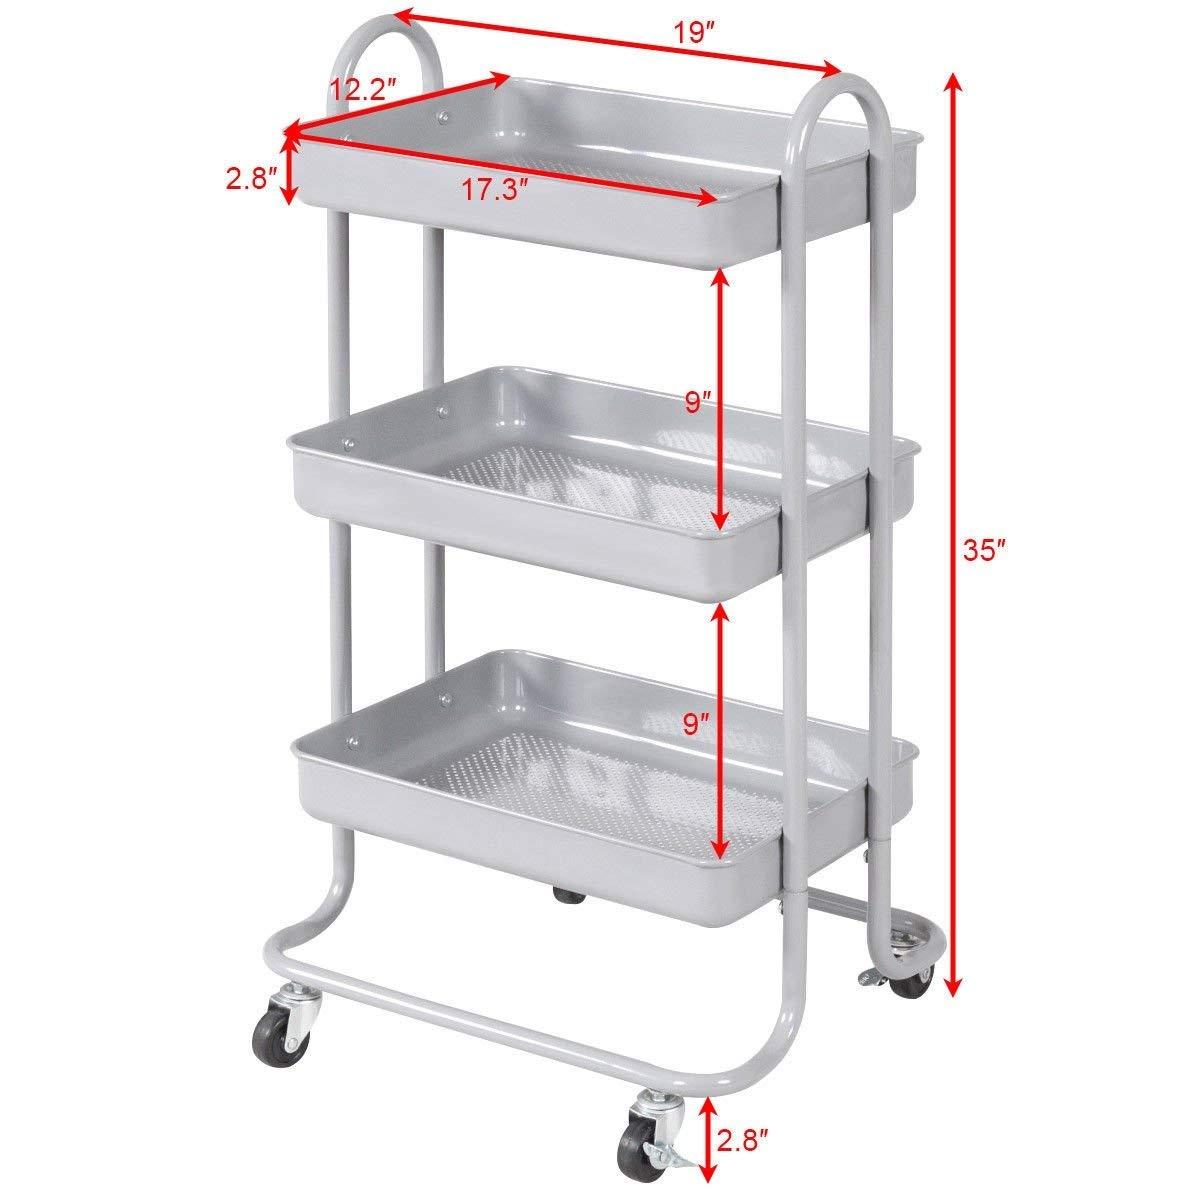 Svitlife 3-Tier Steel Rolling Kitchen Trolley Cart Storage Serving Island Utility Gray Rack Island Tiers Tier Shelf Utility 3 Mesh 5 Basket Top Stainless 4 Wheels